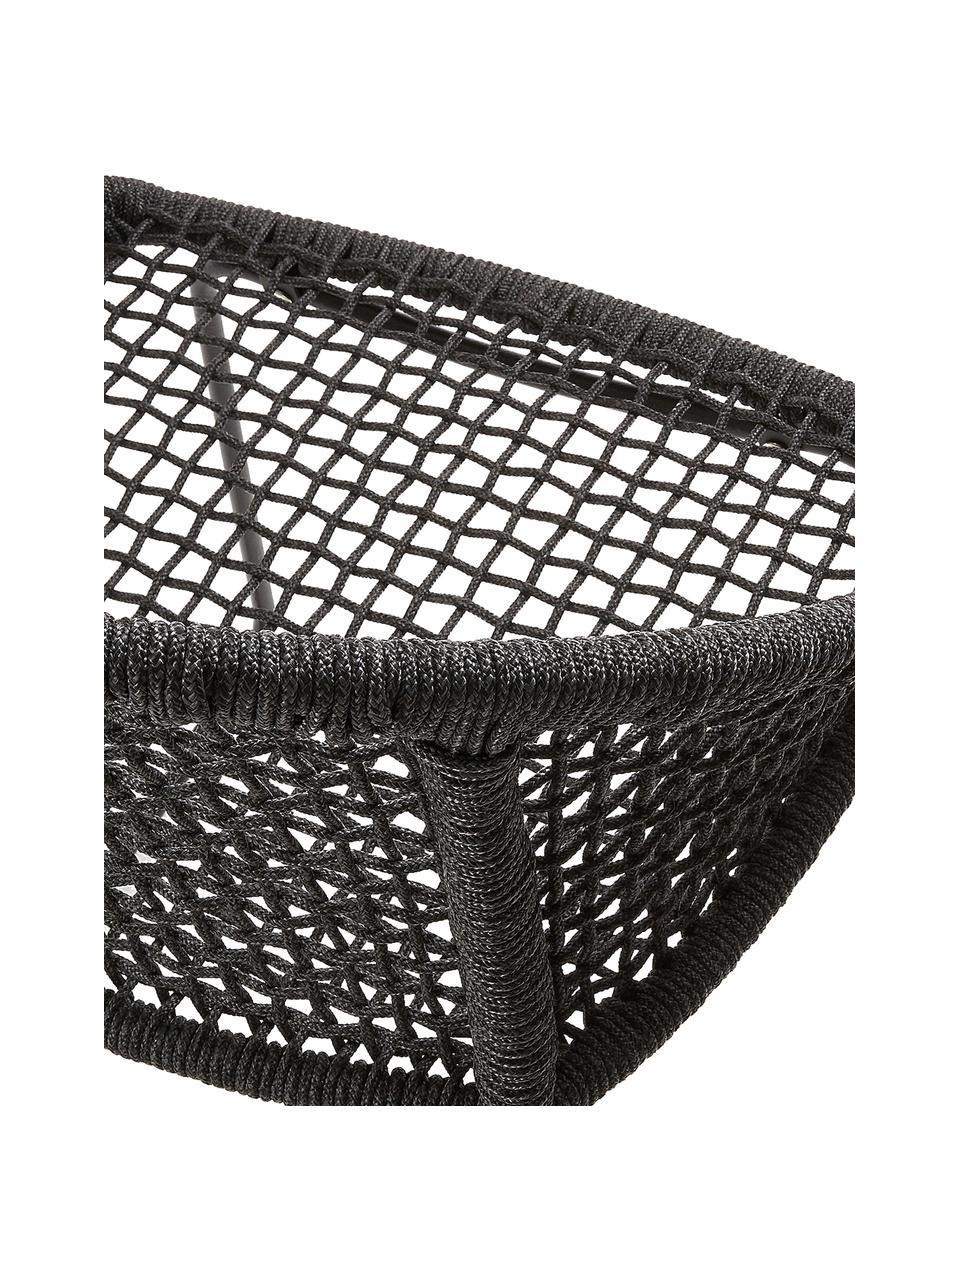 Zahradní židle s područkami Sania, 2 ks, Tmavě šedá